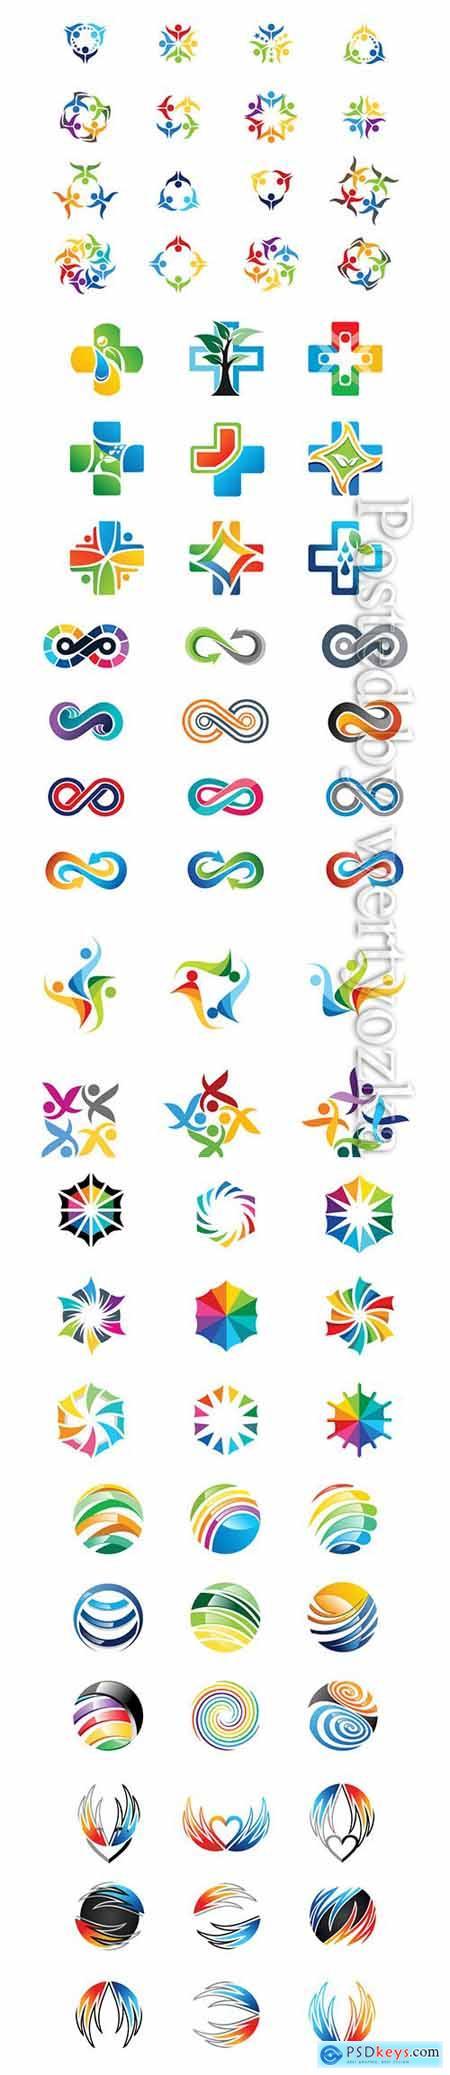 Designer logos in vector